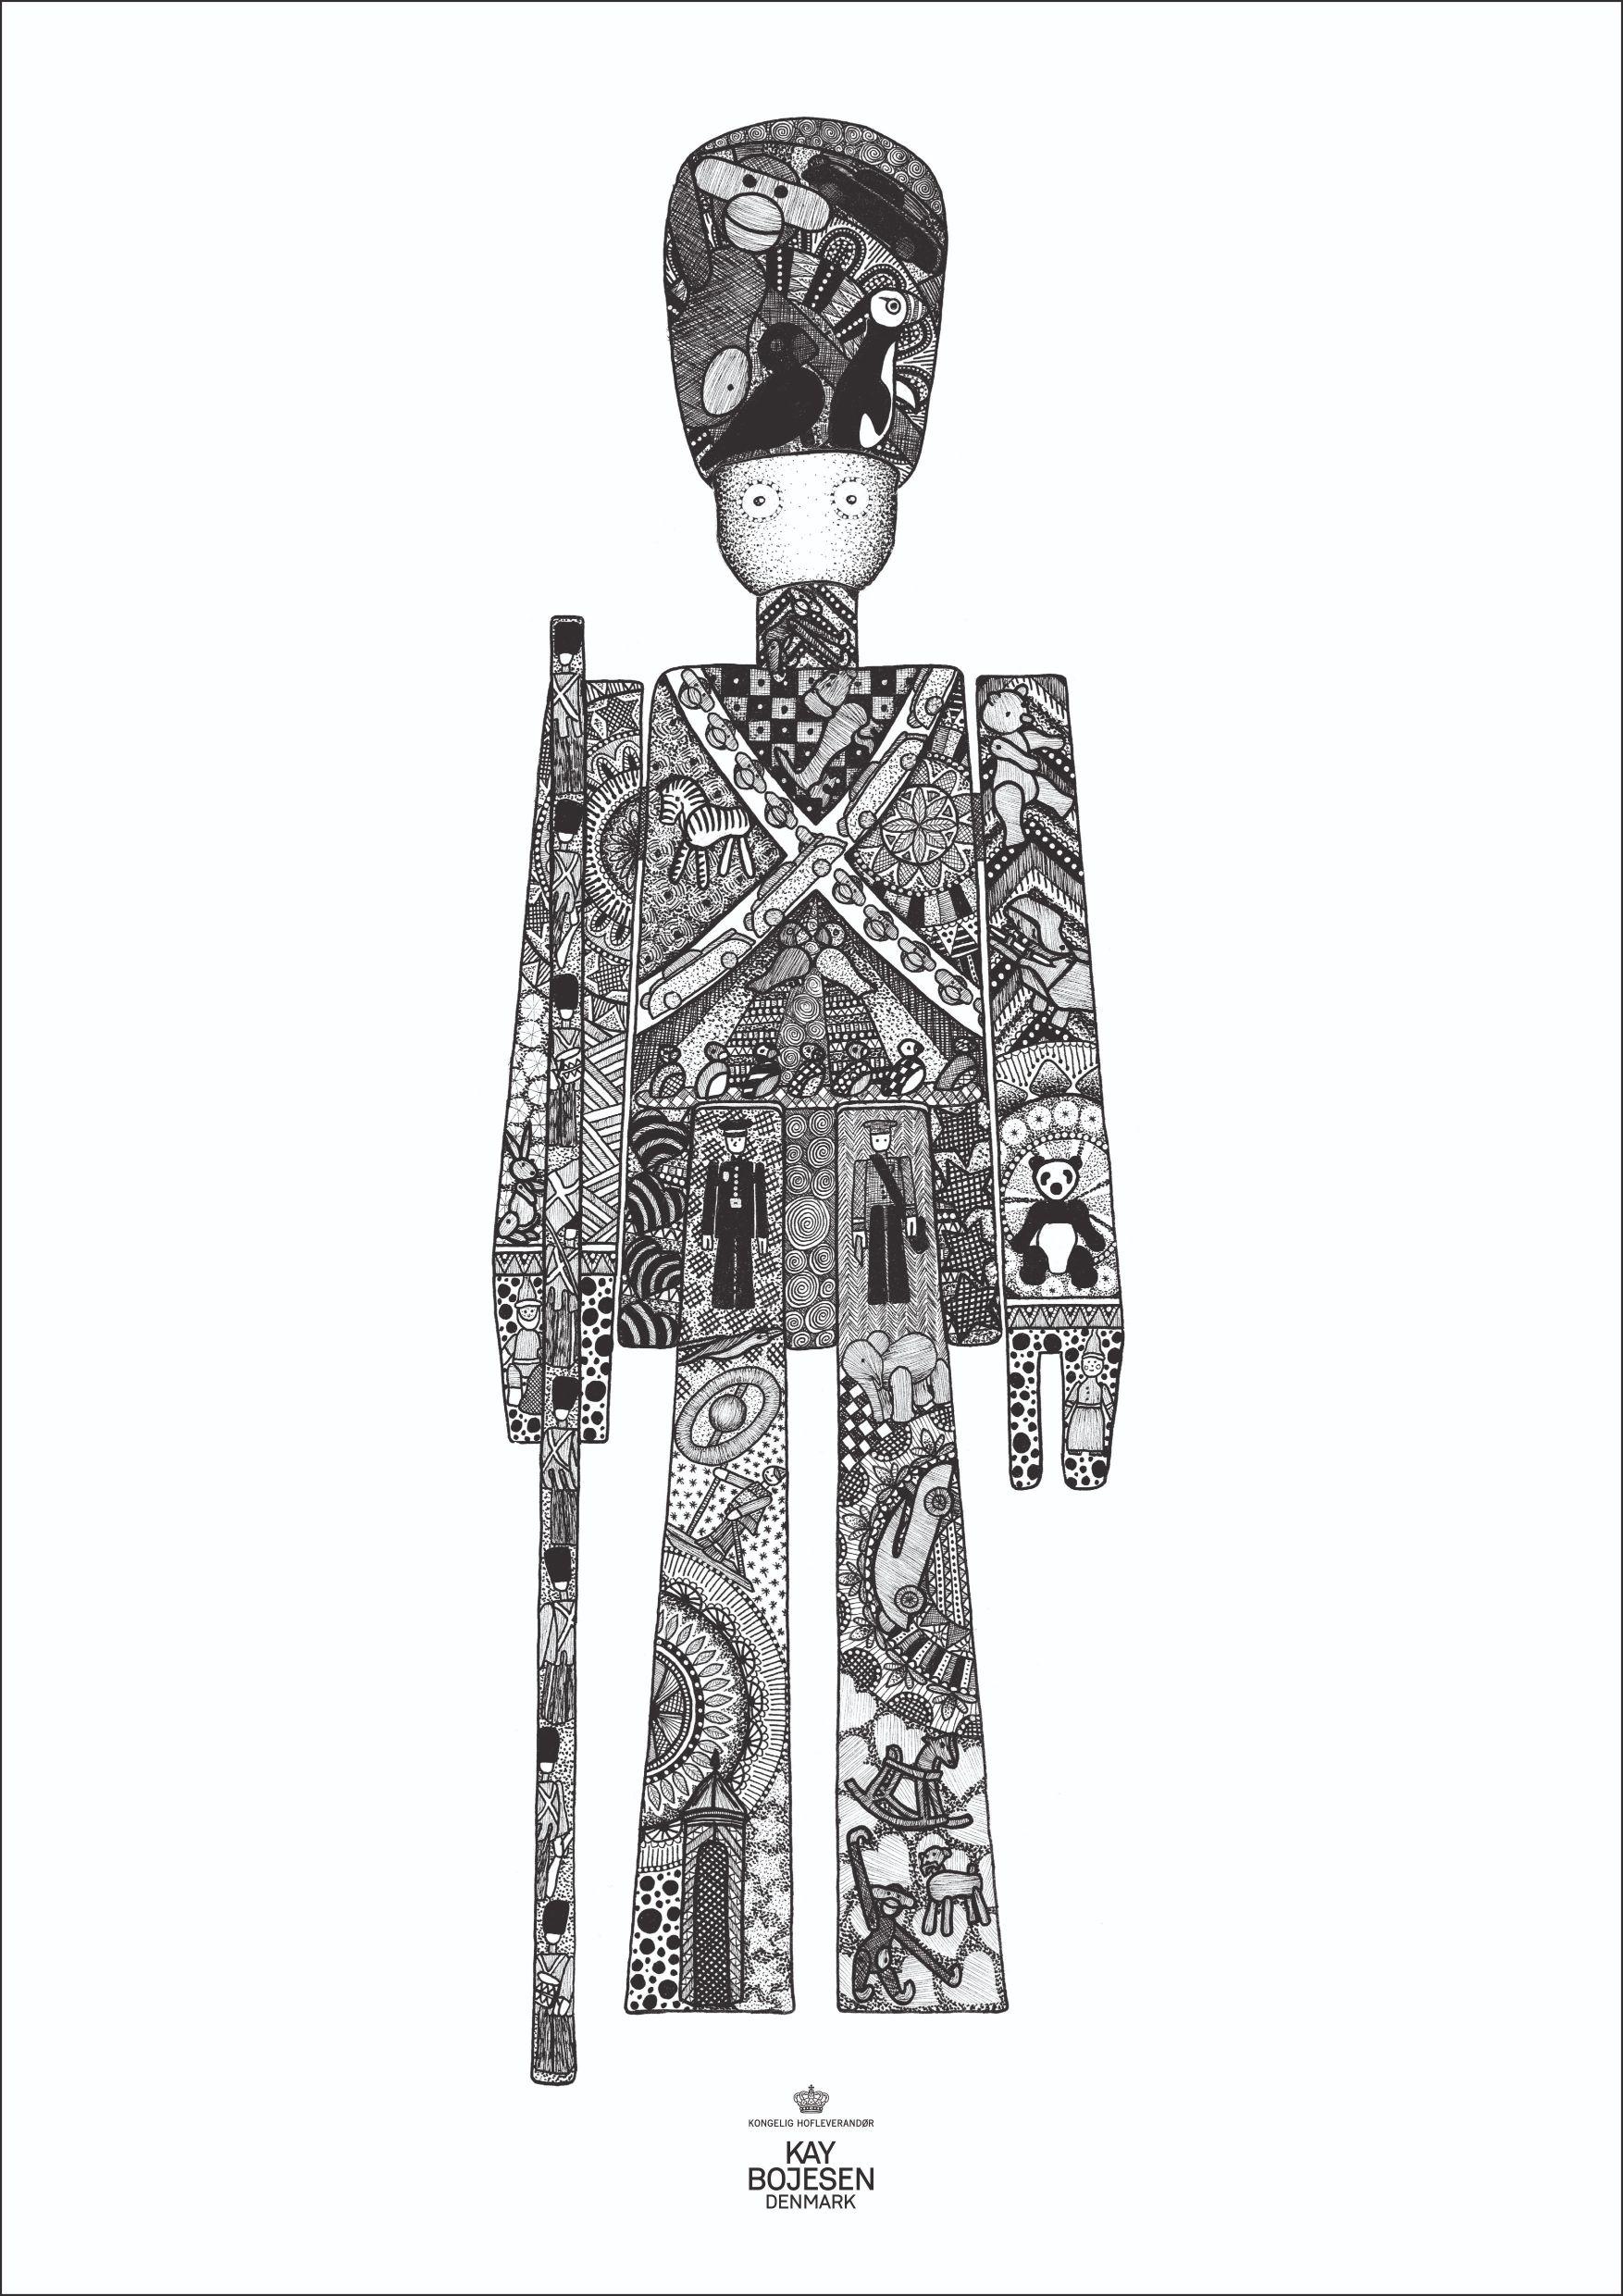 Kay Bojesen plakat, garder, 30x40 cm